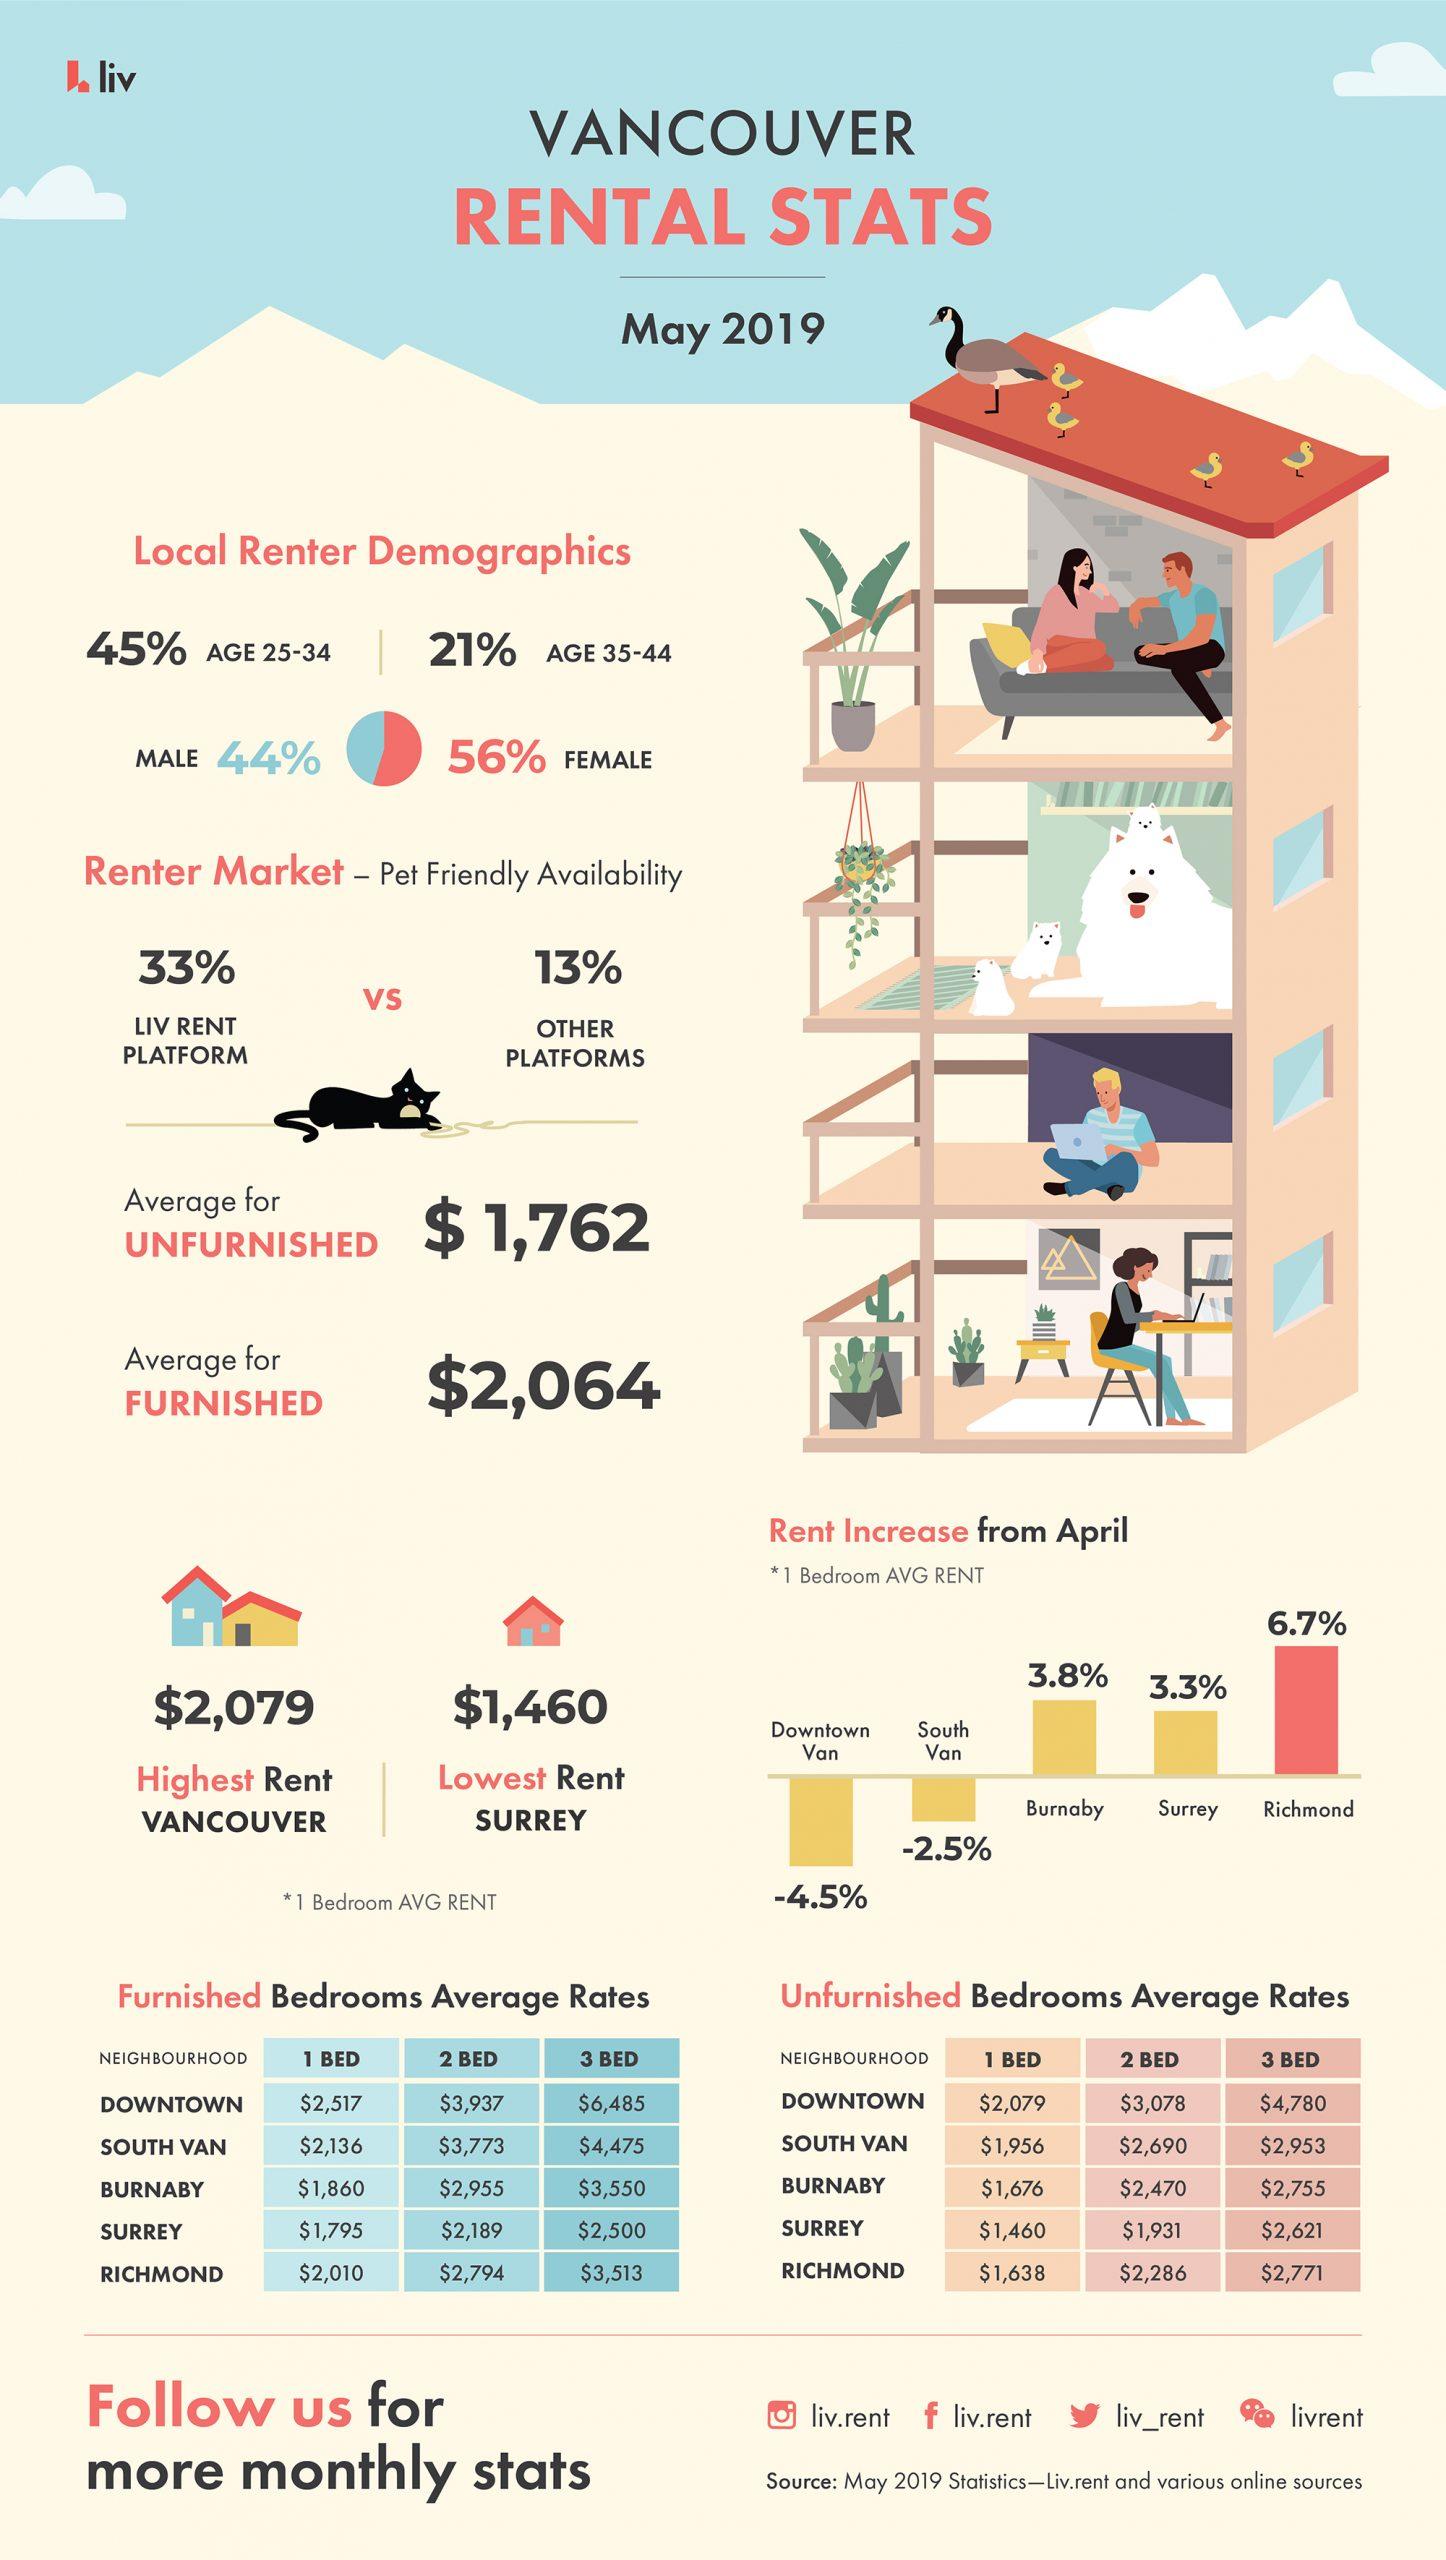 Vancouver Rental Stats May 2019 - Average Rental Prices - Renter demographics - Renter Market